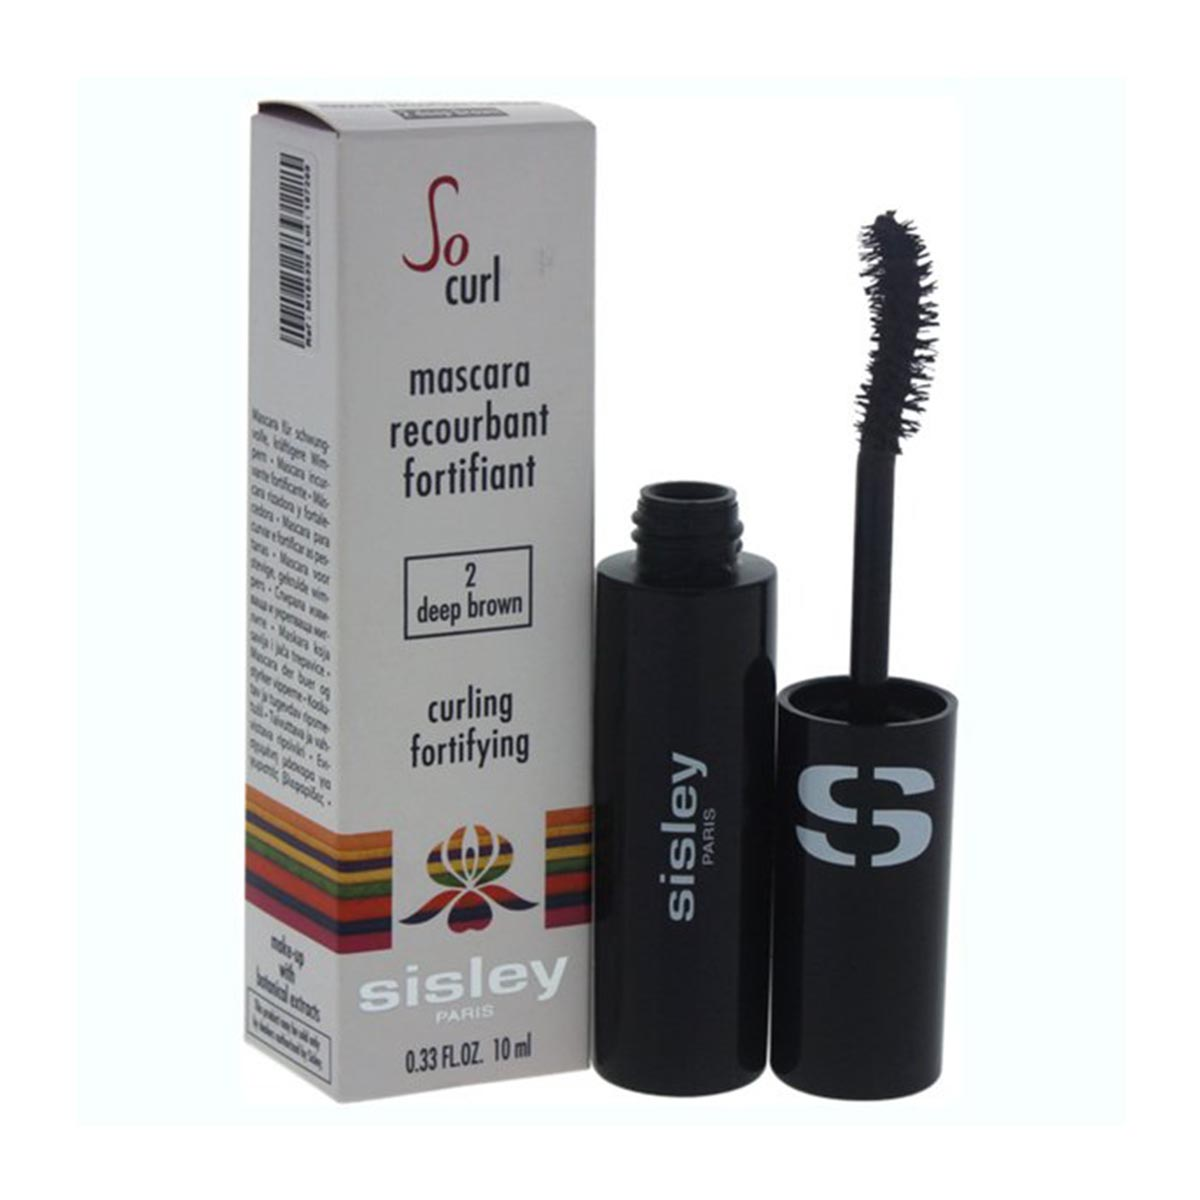 Sisley mascara so volume 02 deep brown